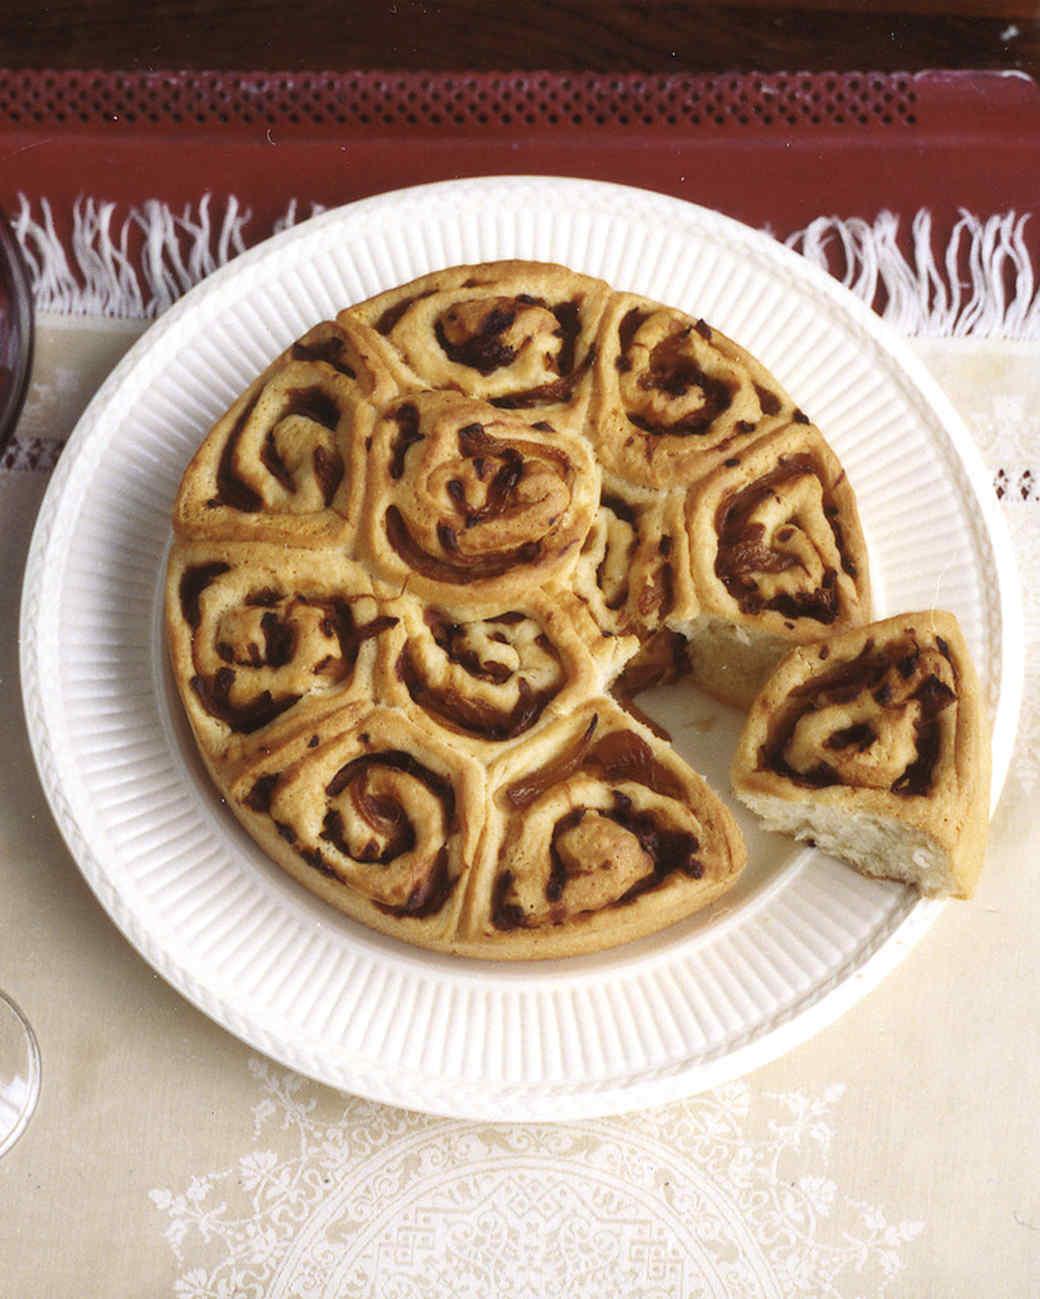 Buttermilk-Onion Pull-Apart Rolls